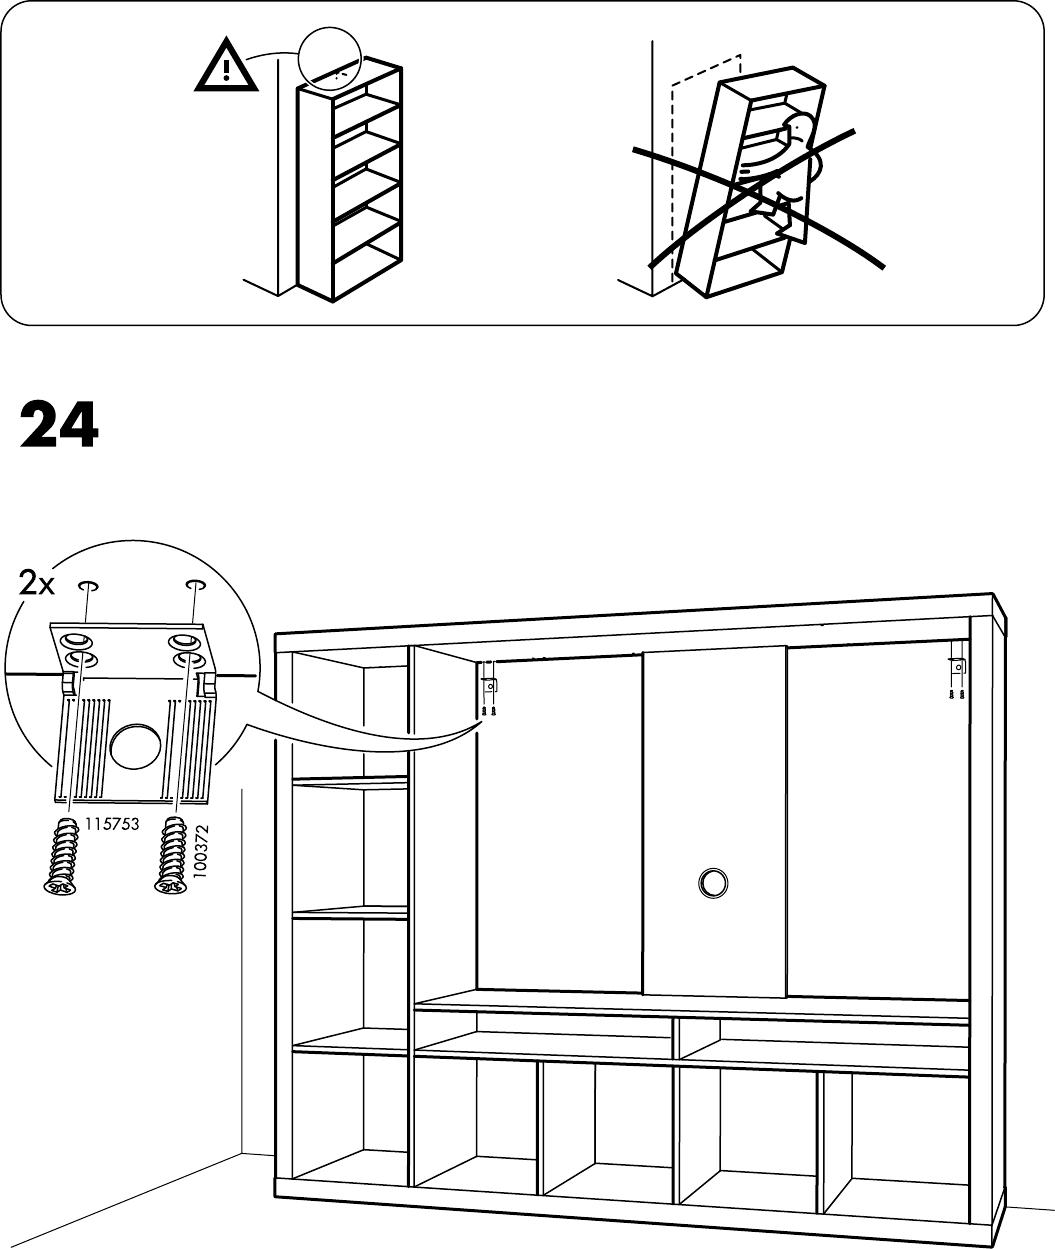 Expedit Tv Kast.Handleiding Ikea Expedit Tv Kast Pagina 31 Van 32 Alle Talen